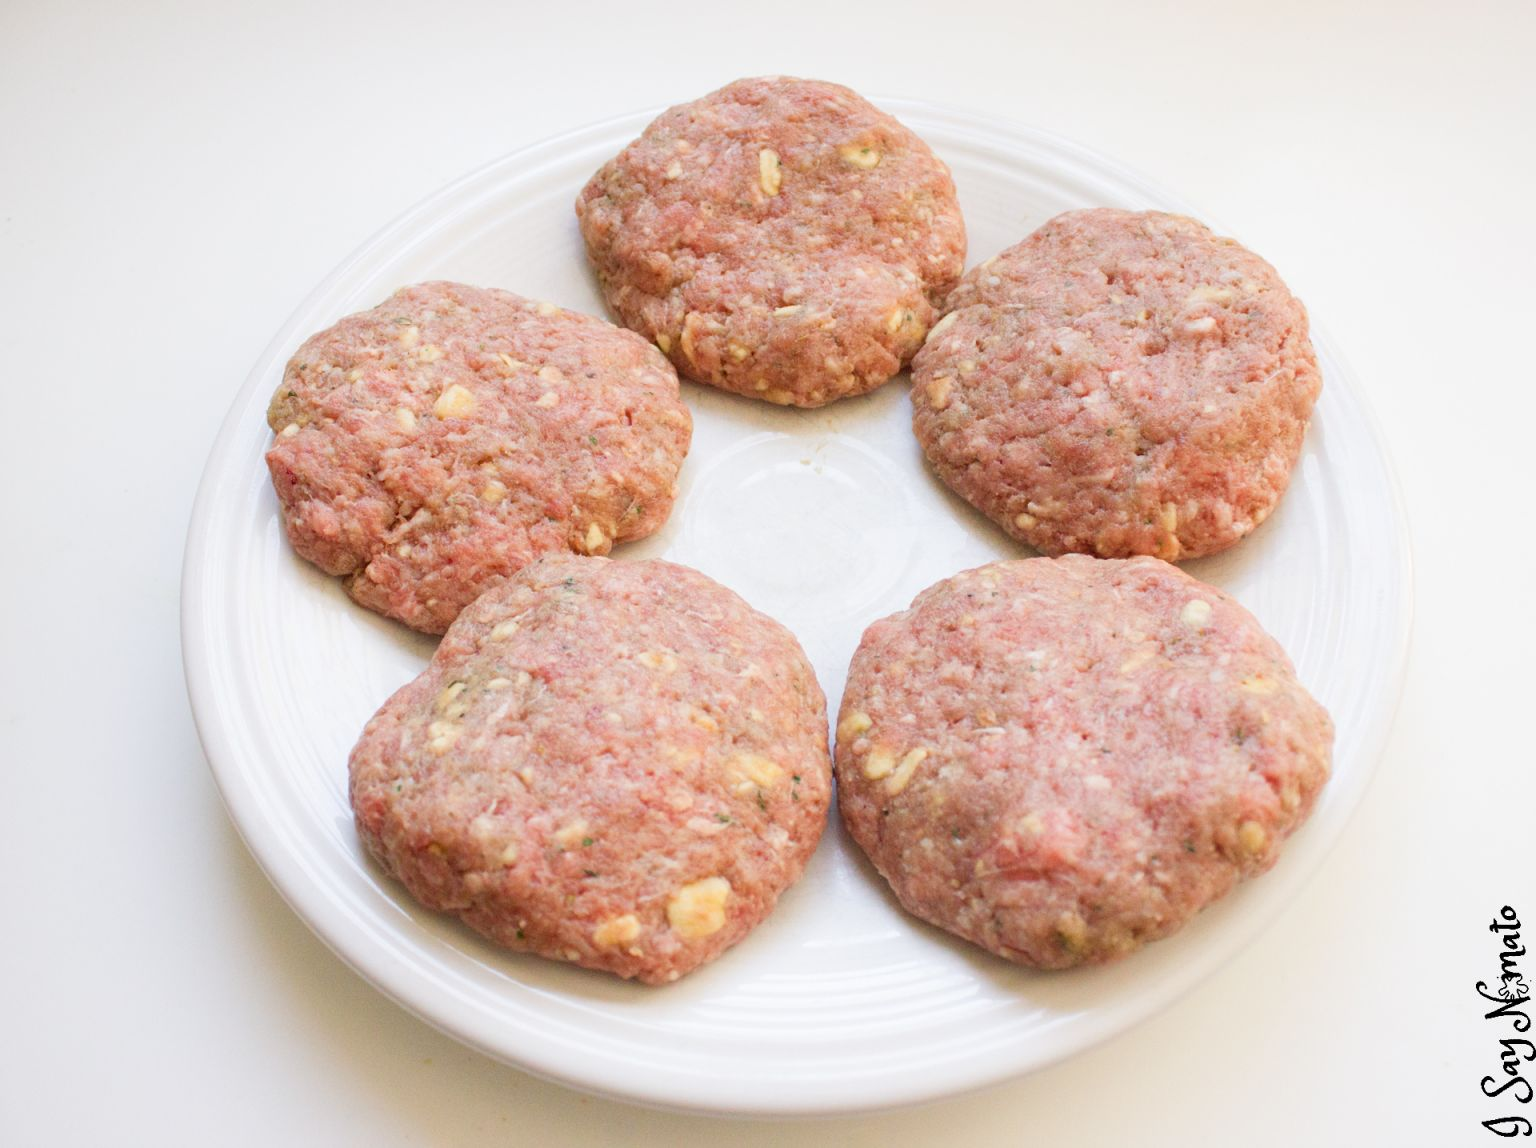 nightshade free backyard burgers i say nomato